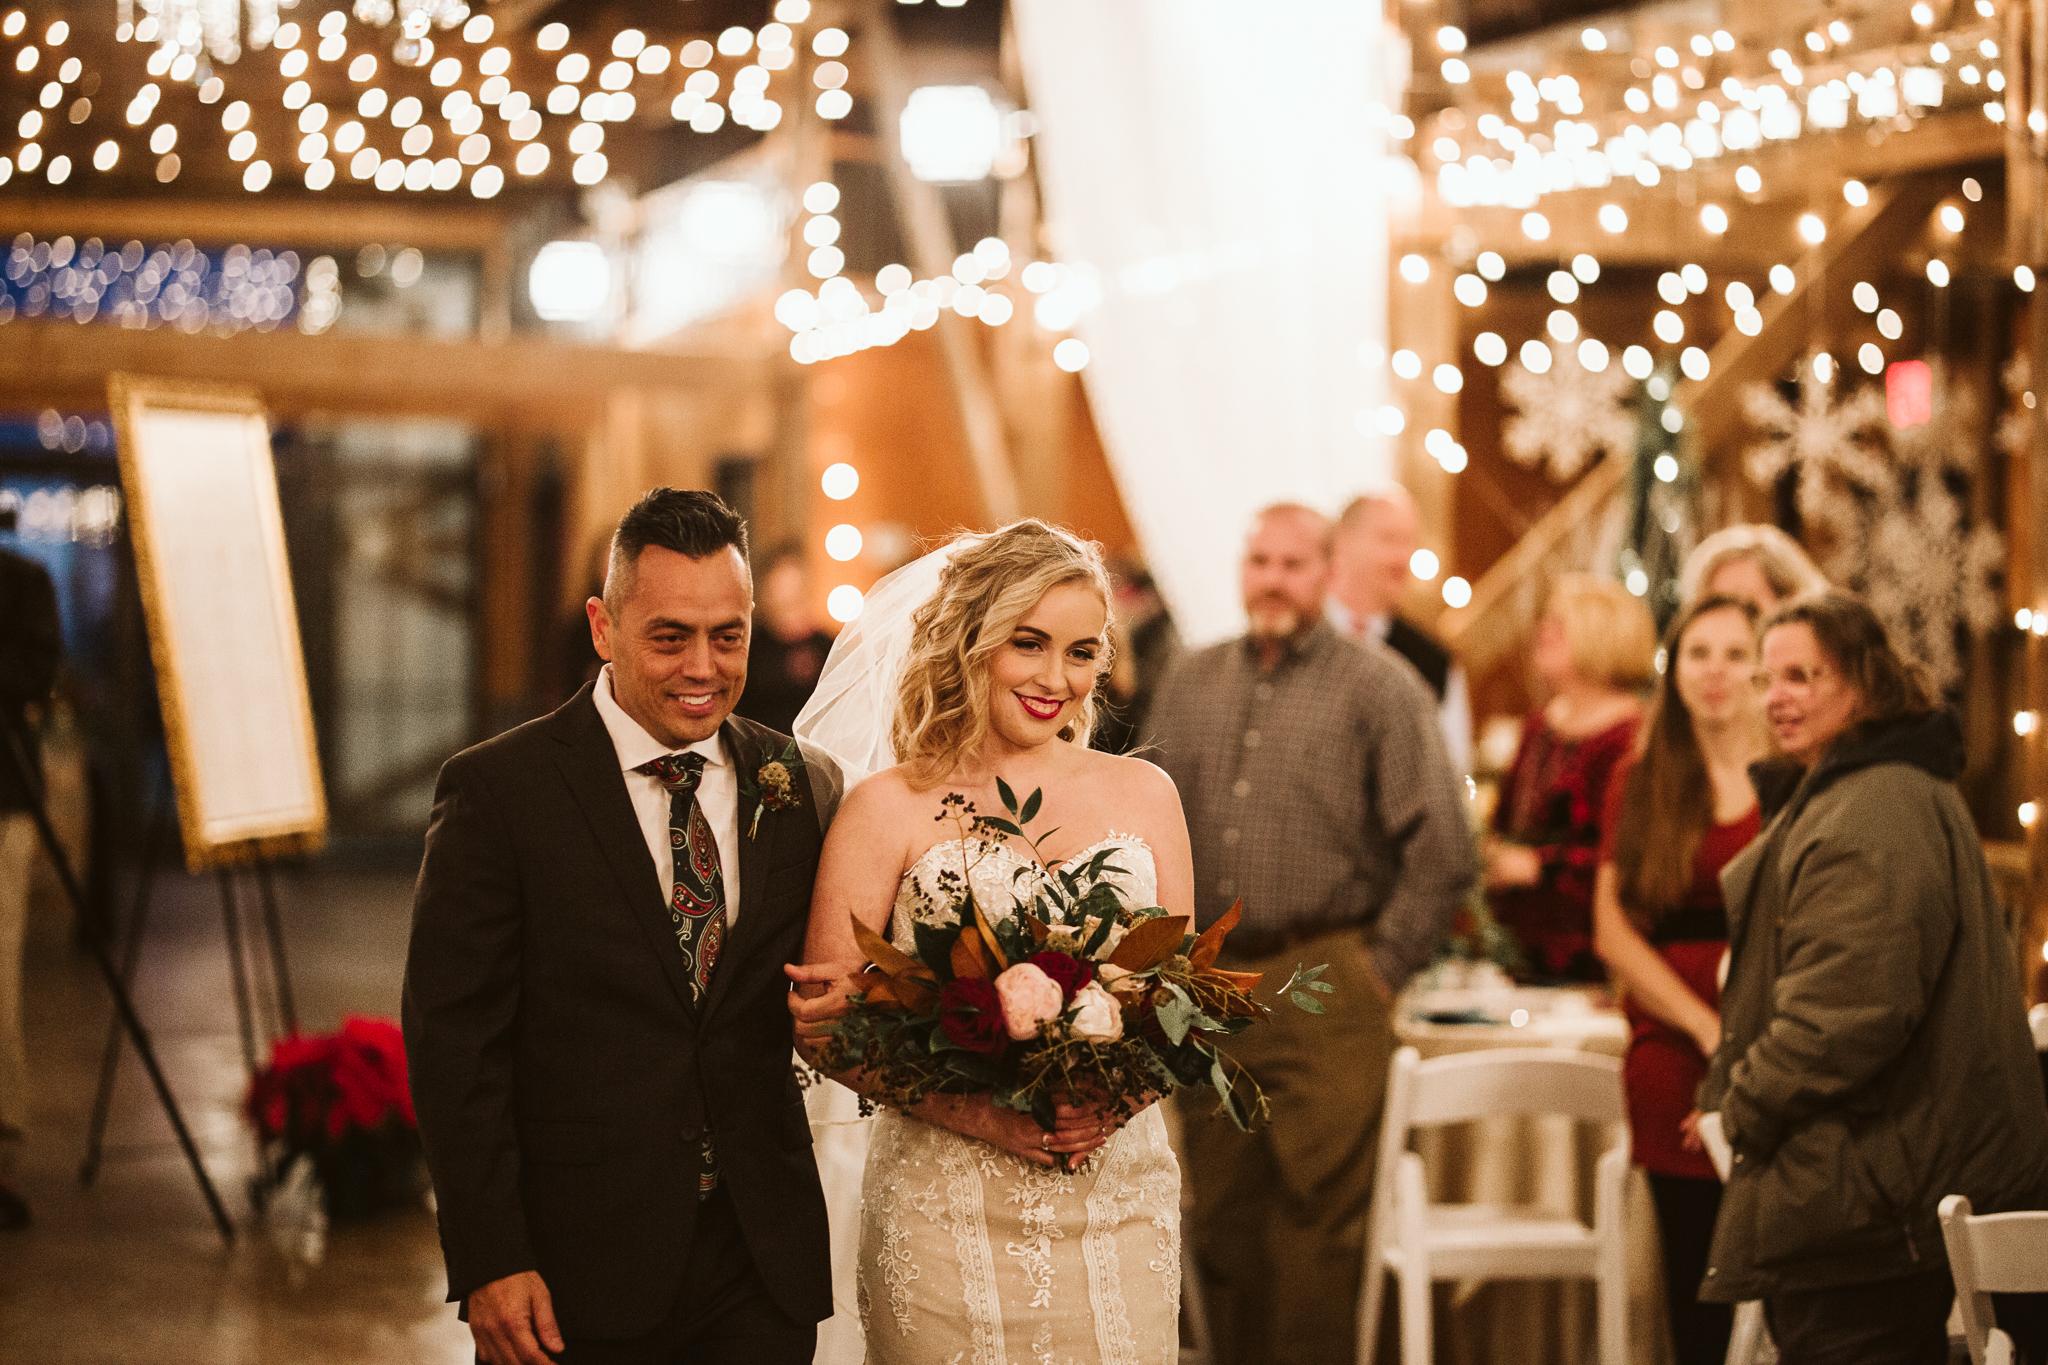 0117 Ariana Jordan Photo - Cameron & Lauren's Wedding at Talon Winery  4438.jpg